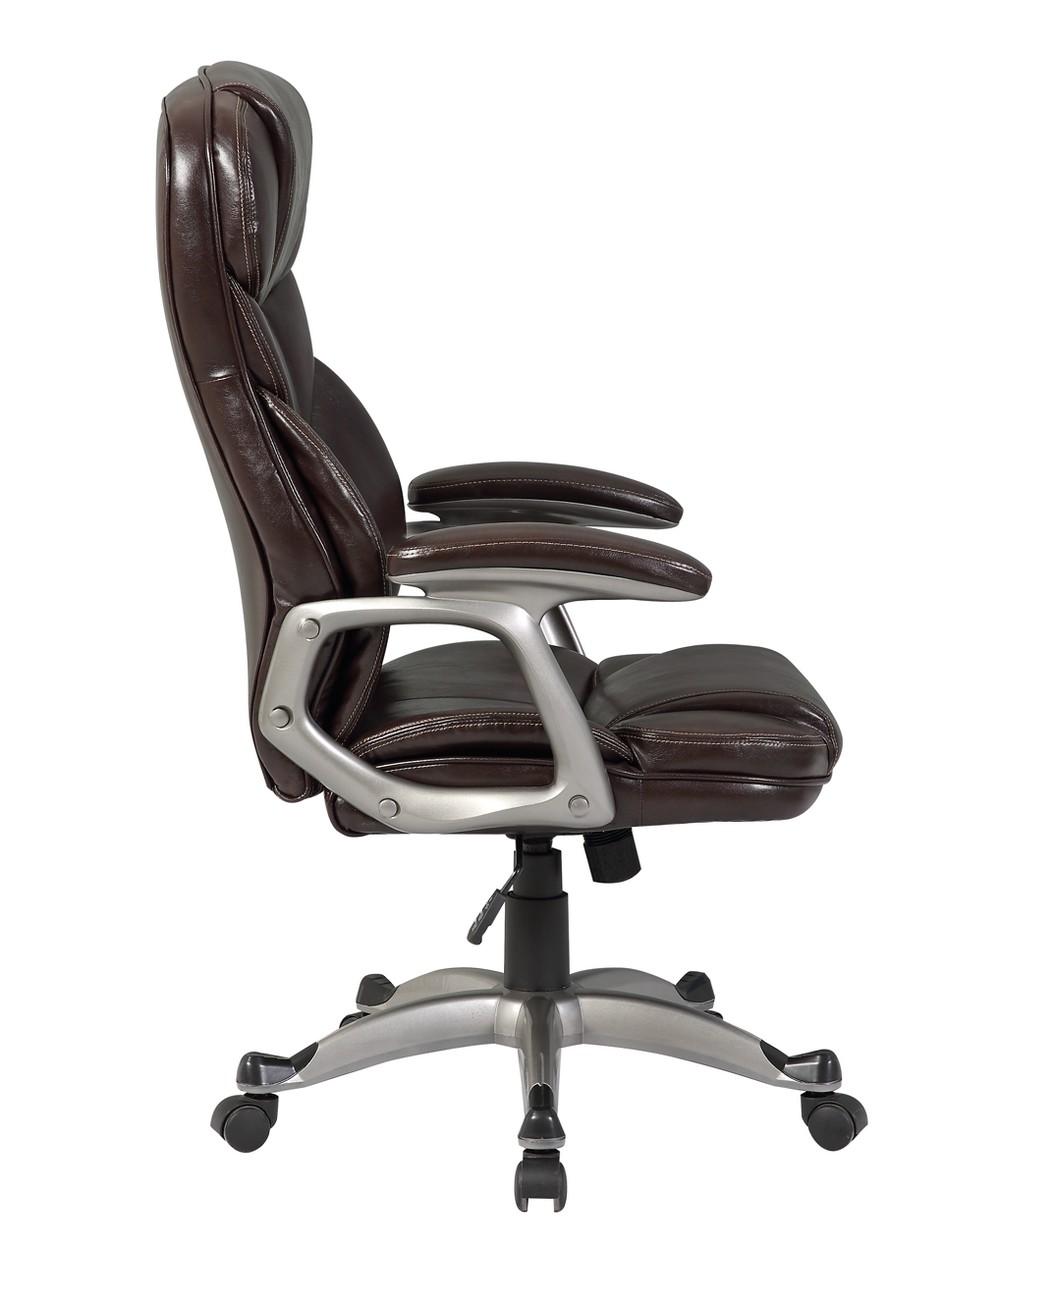 ergonomic chair tilt serta warranty executive office pu leather high back desk